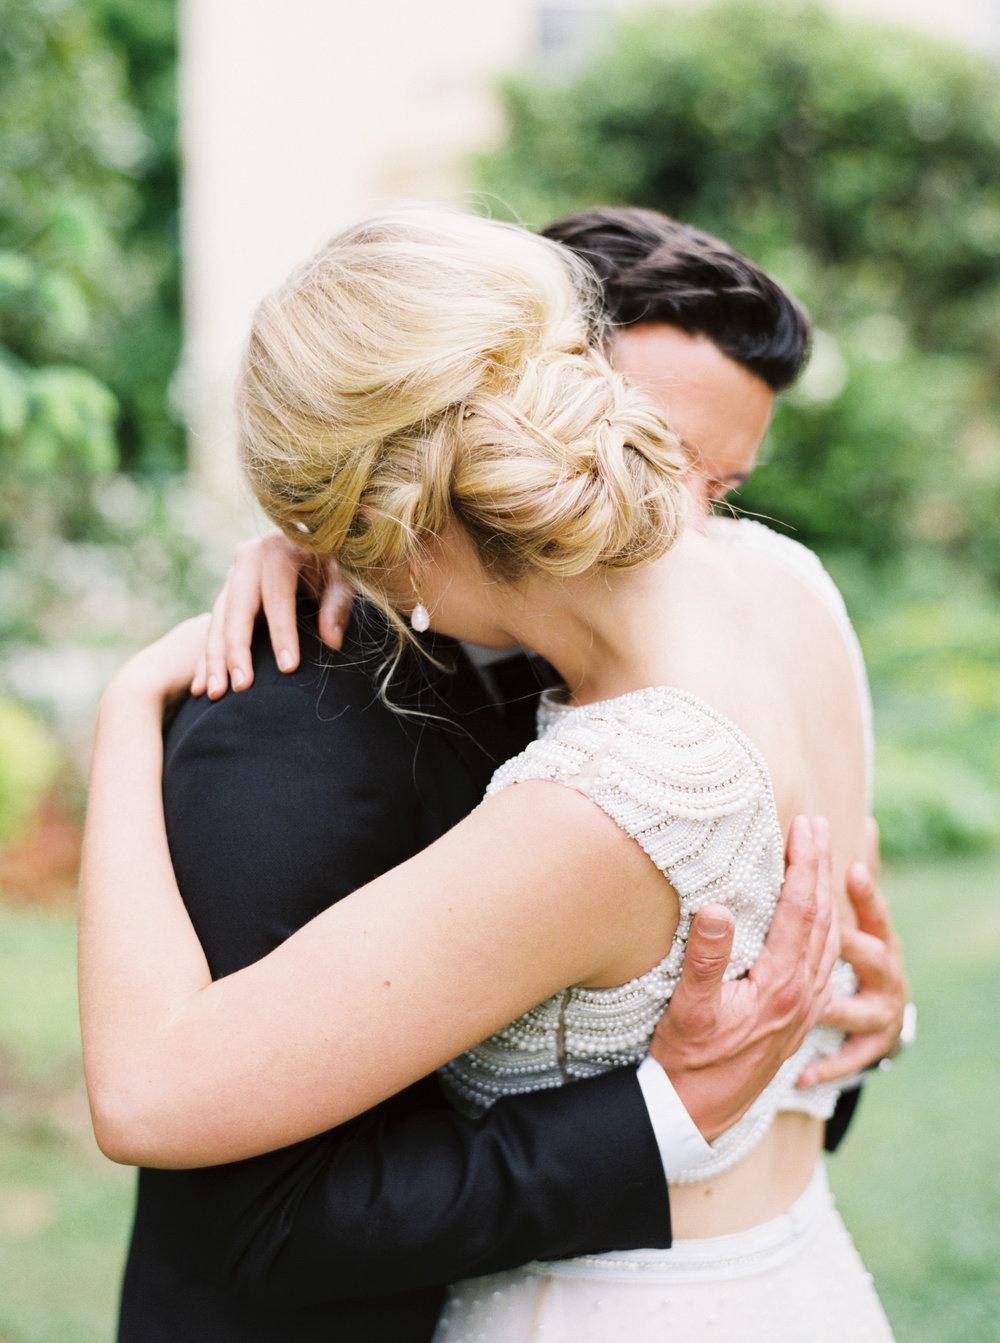 Timeless Southern Highland Wedding Elopement in Bowral NSW Fine Art Film Photographer Sheri McMahon-45.jpg